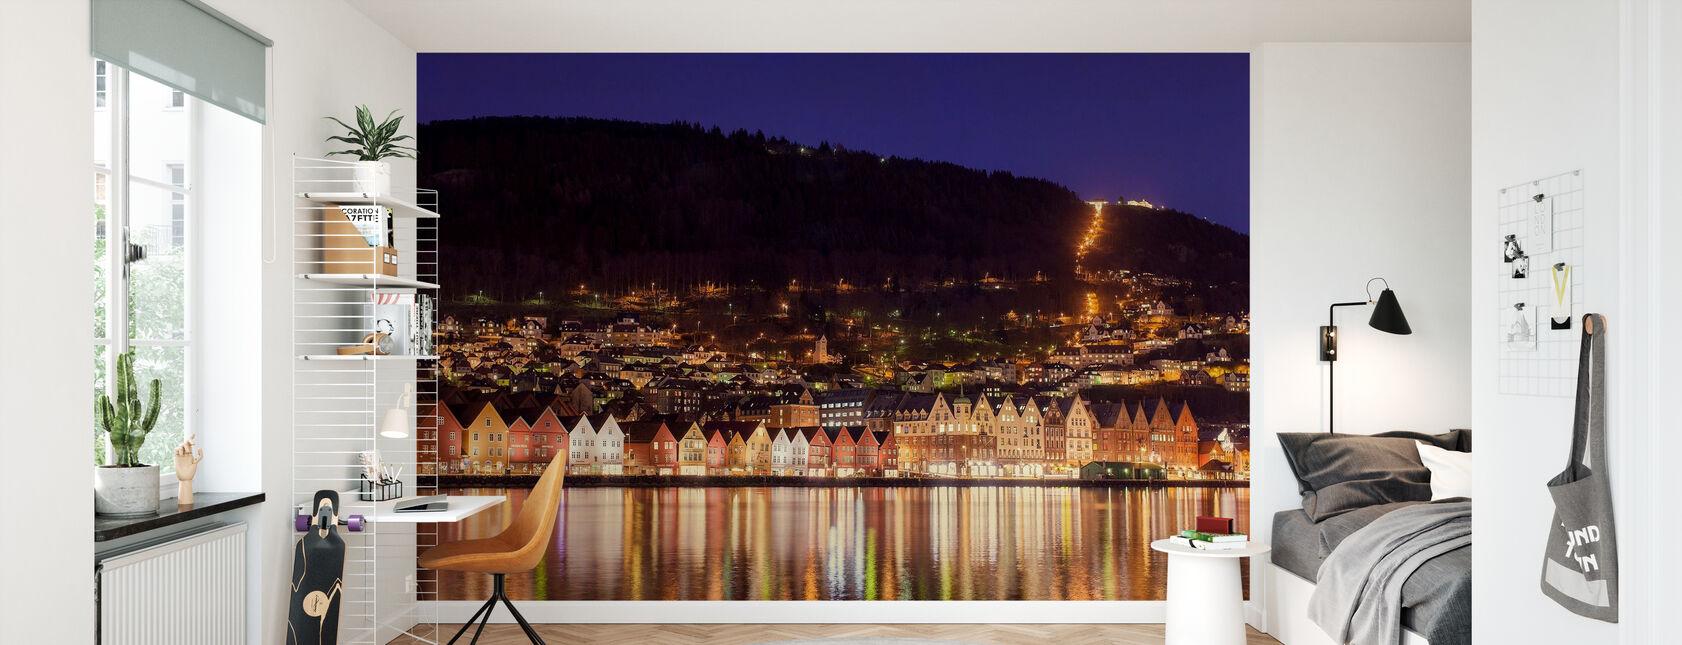 Fargerike Hus i Bergen, Norge - Tapet - Barnerom